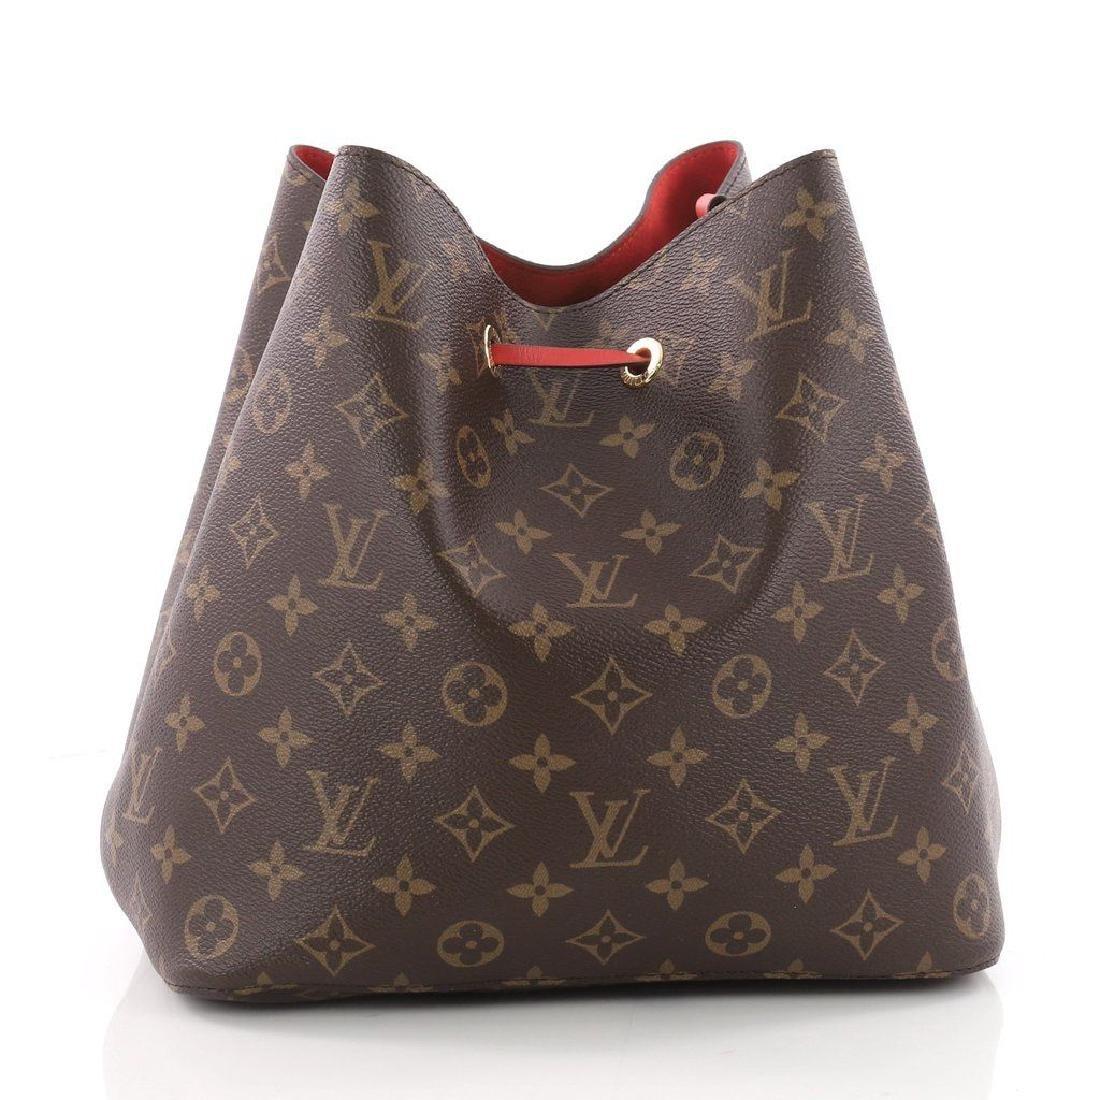 Louis Vuitton Neonoe Monogram Bucket Bag Drawstring - 3